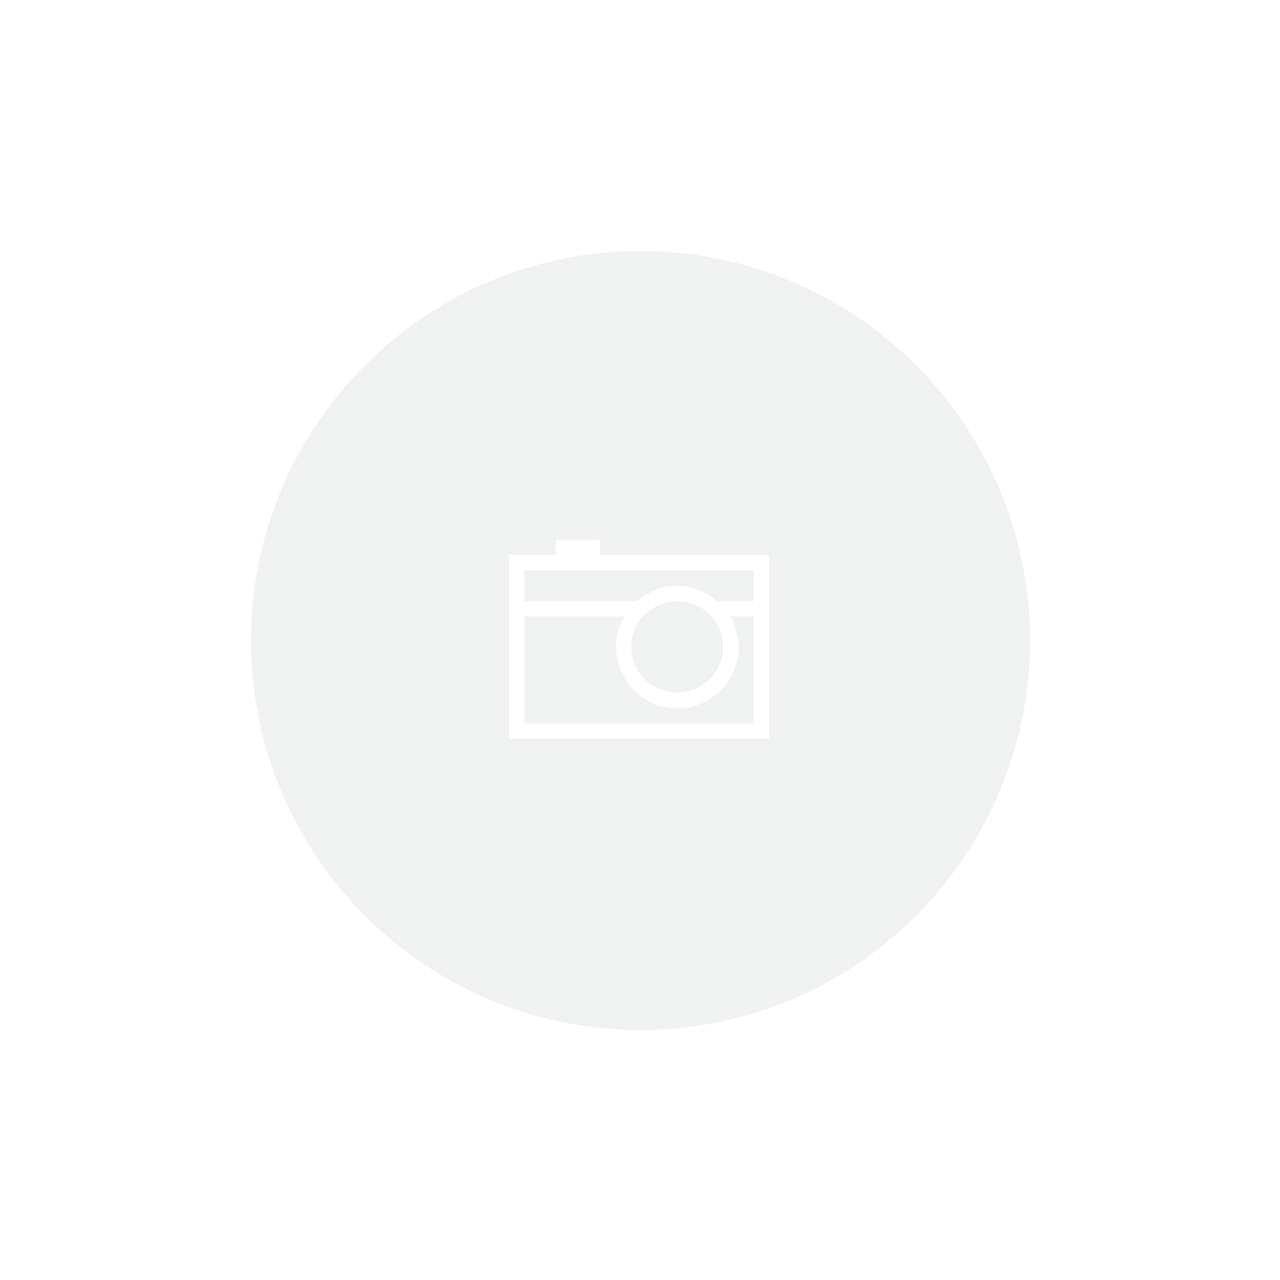 Moedor Sal/Pimenta 14 cm Transparente